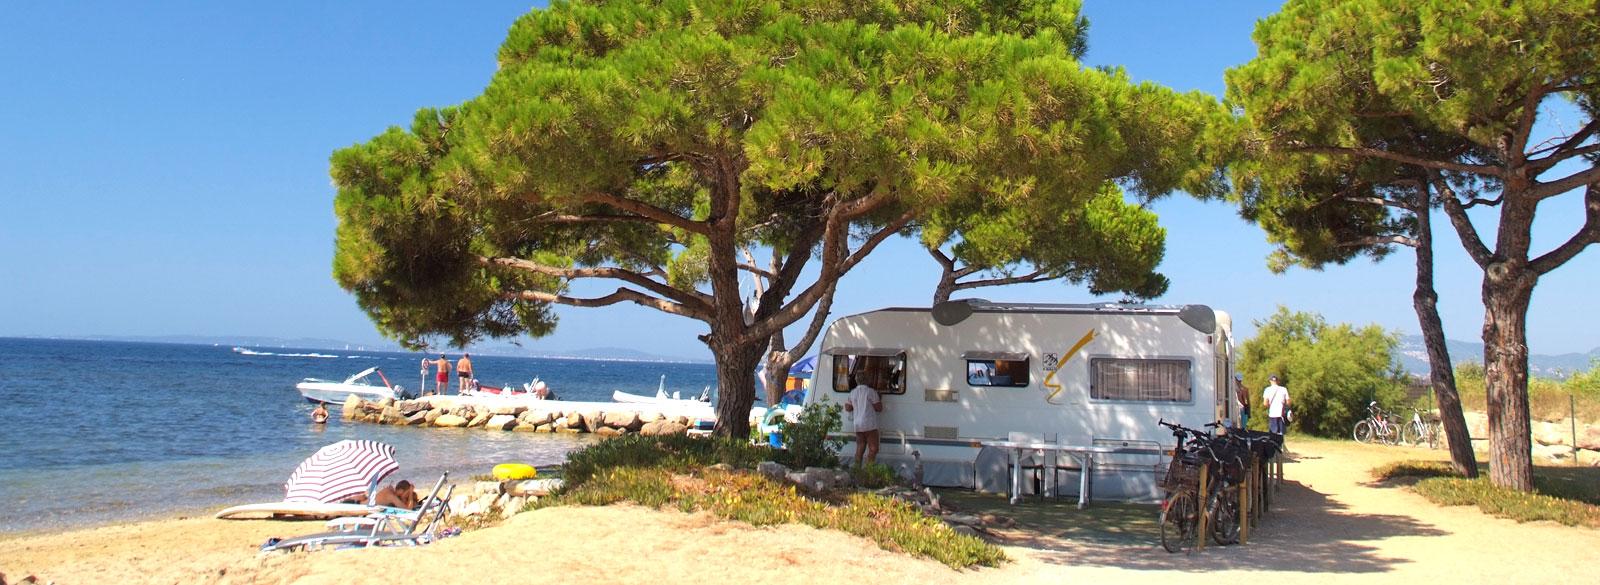 camping fort de bregancon - Vue aerienne du camping